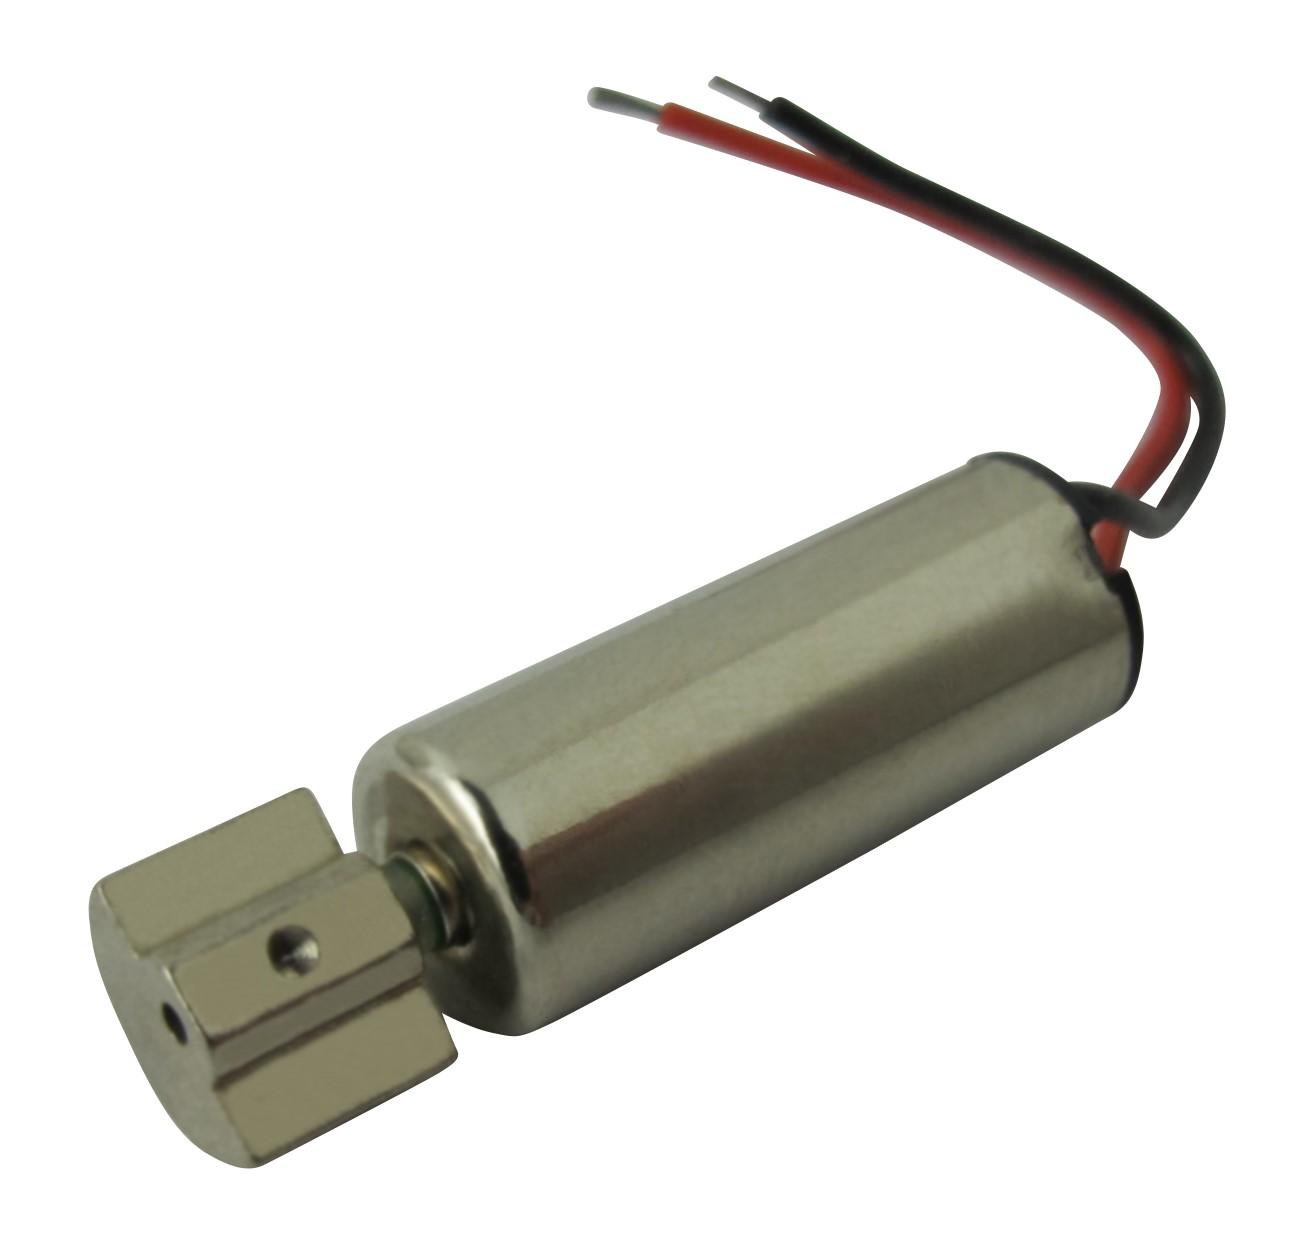 Z6CL2A0080001 Cylindrical Vibrator Motor